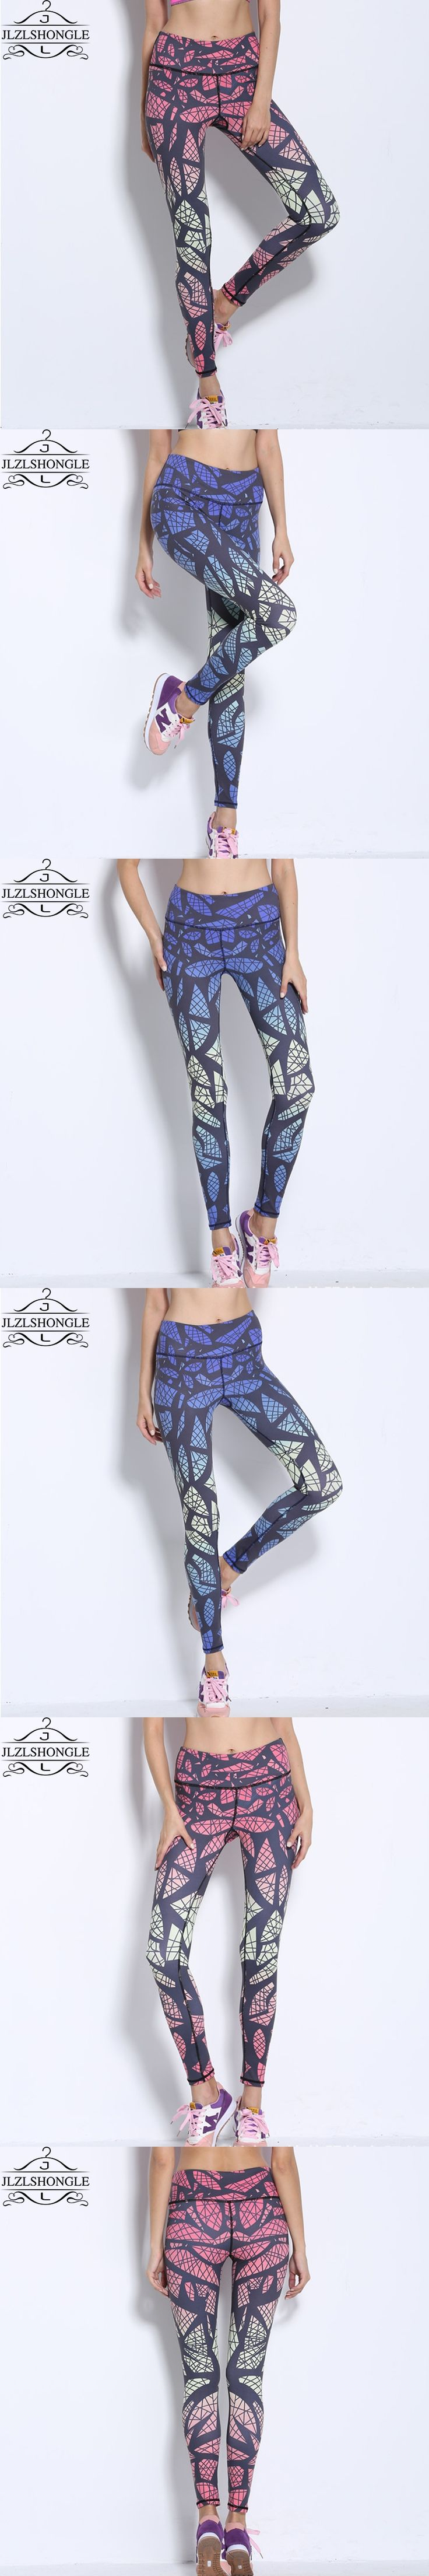 Ropa Deportiva Mujer Fitness 2016 New Style Bird's Nest Pattern Printed Famale Leggings Fitness Leggings Famale Capris